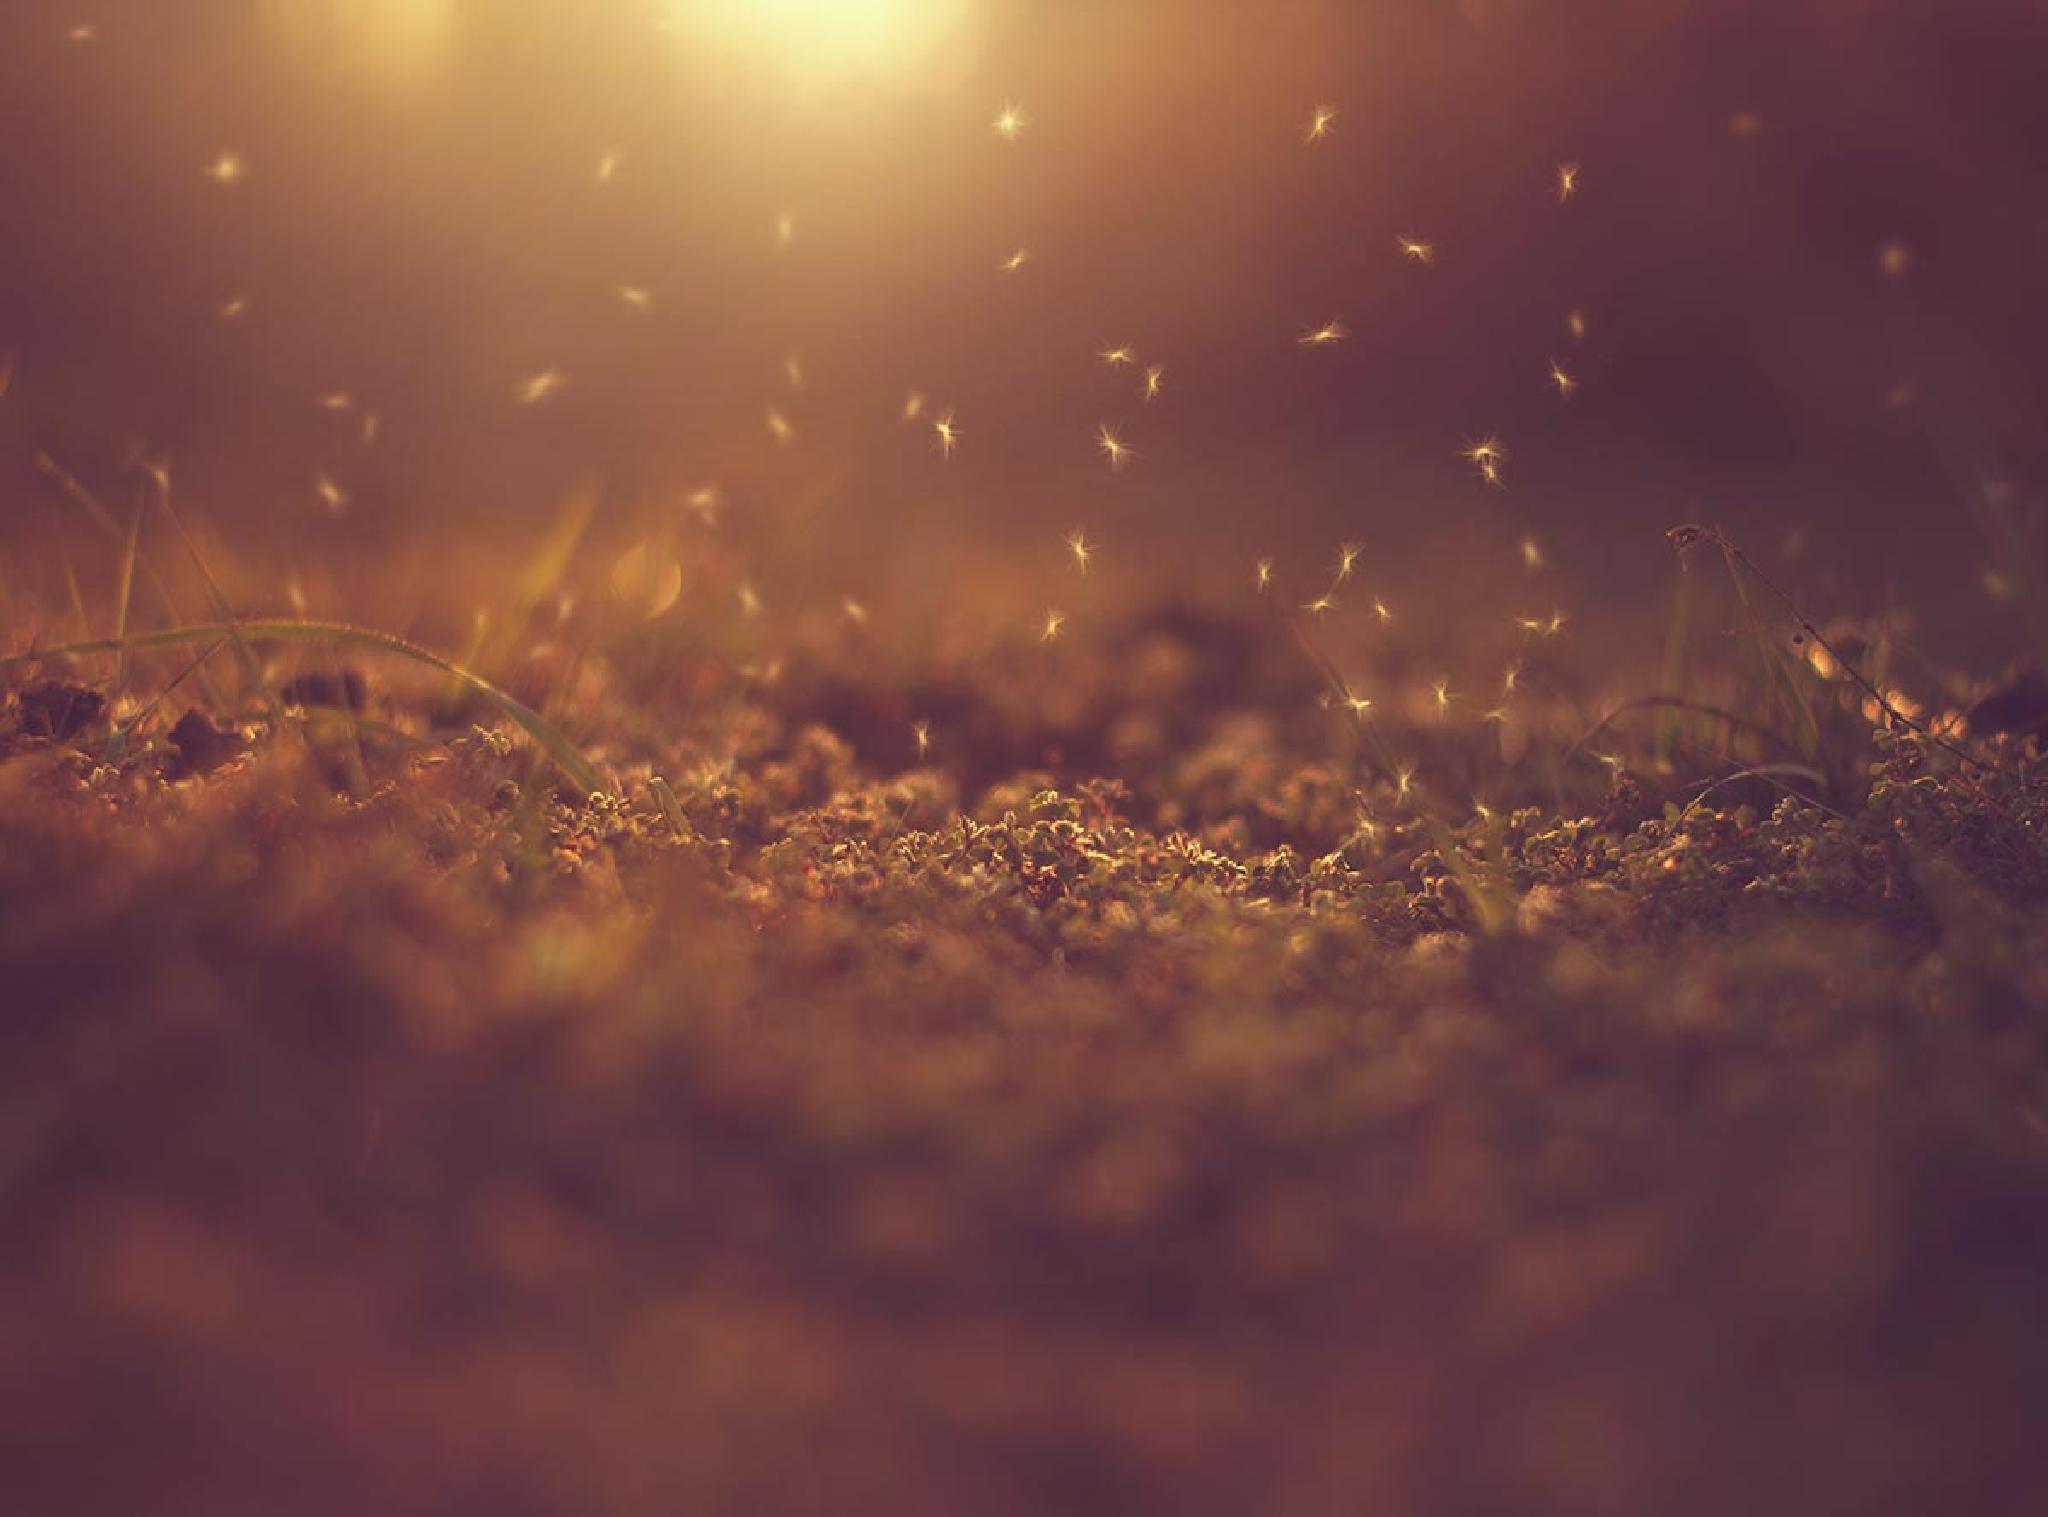 Little fairies  by Ashraful Arefin